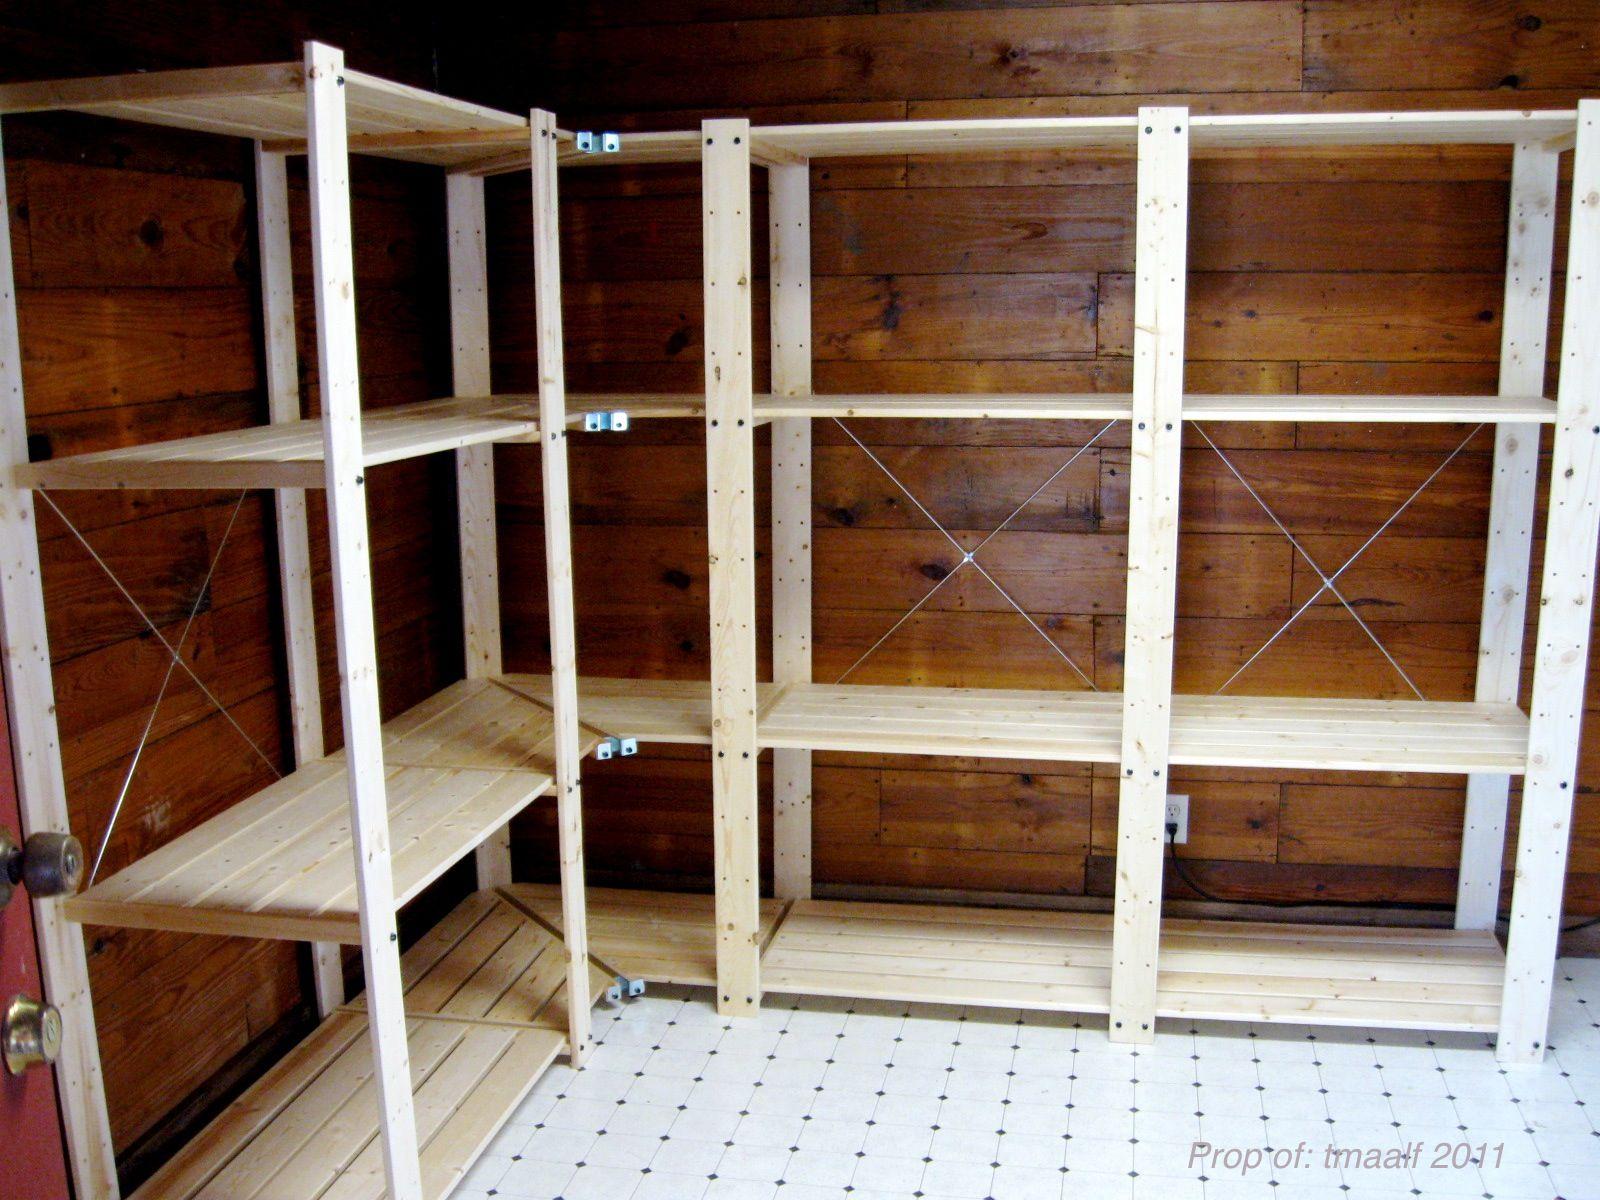 Wooden Display Shelves Ikea Google Search Ikea Storage Shelves Ikea Storage Diy Garage Shelves